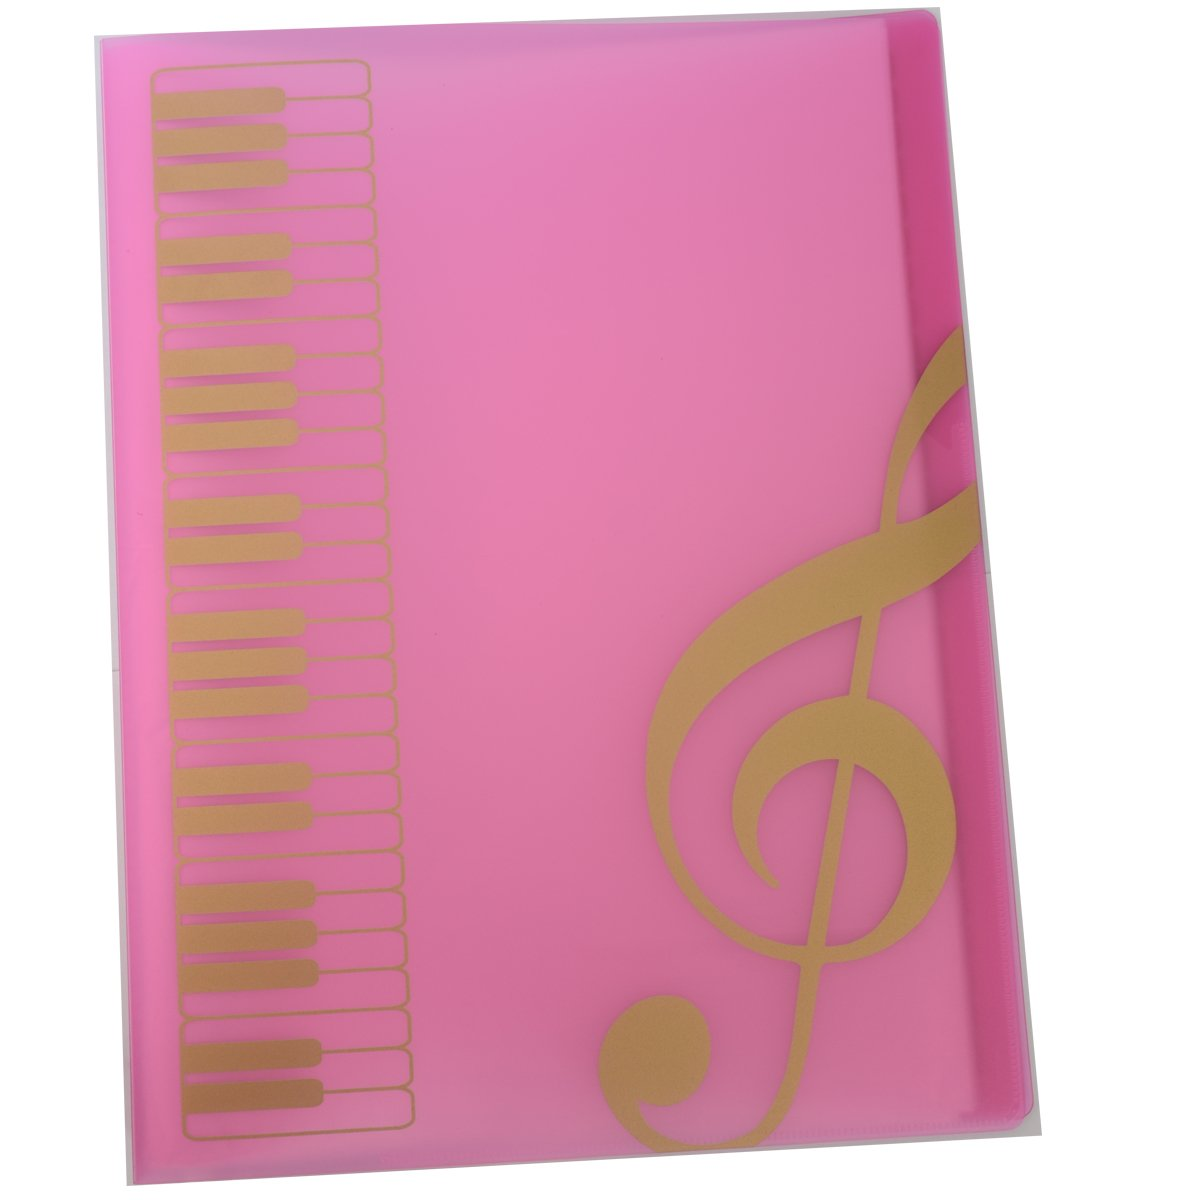 Music Themed Folder Music folder storage Holder,A4 Size Folder,40 Pockets,Treble Clef Folder (Black) Sound harbor Music Folder MG-43